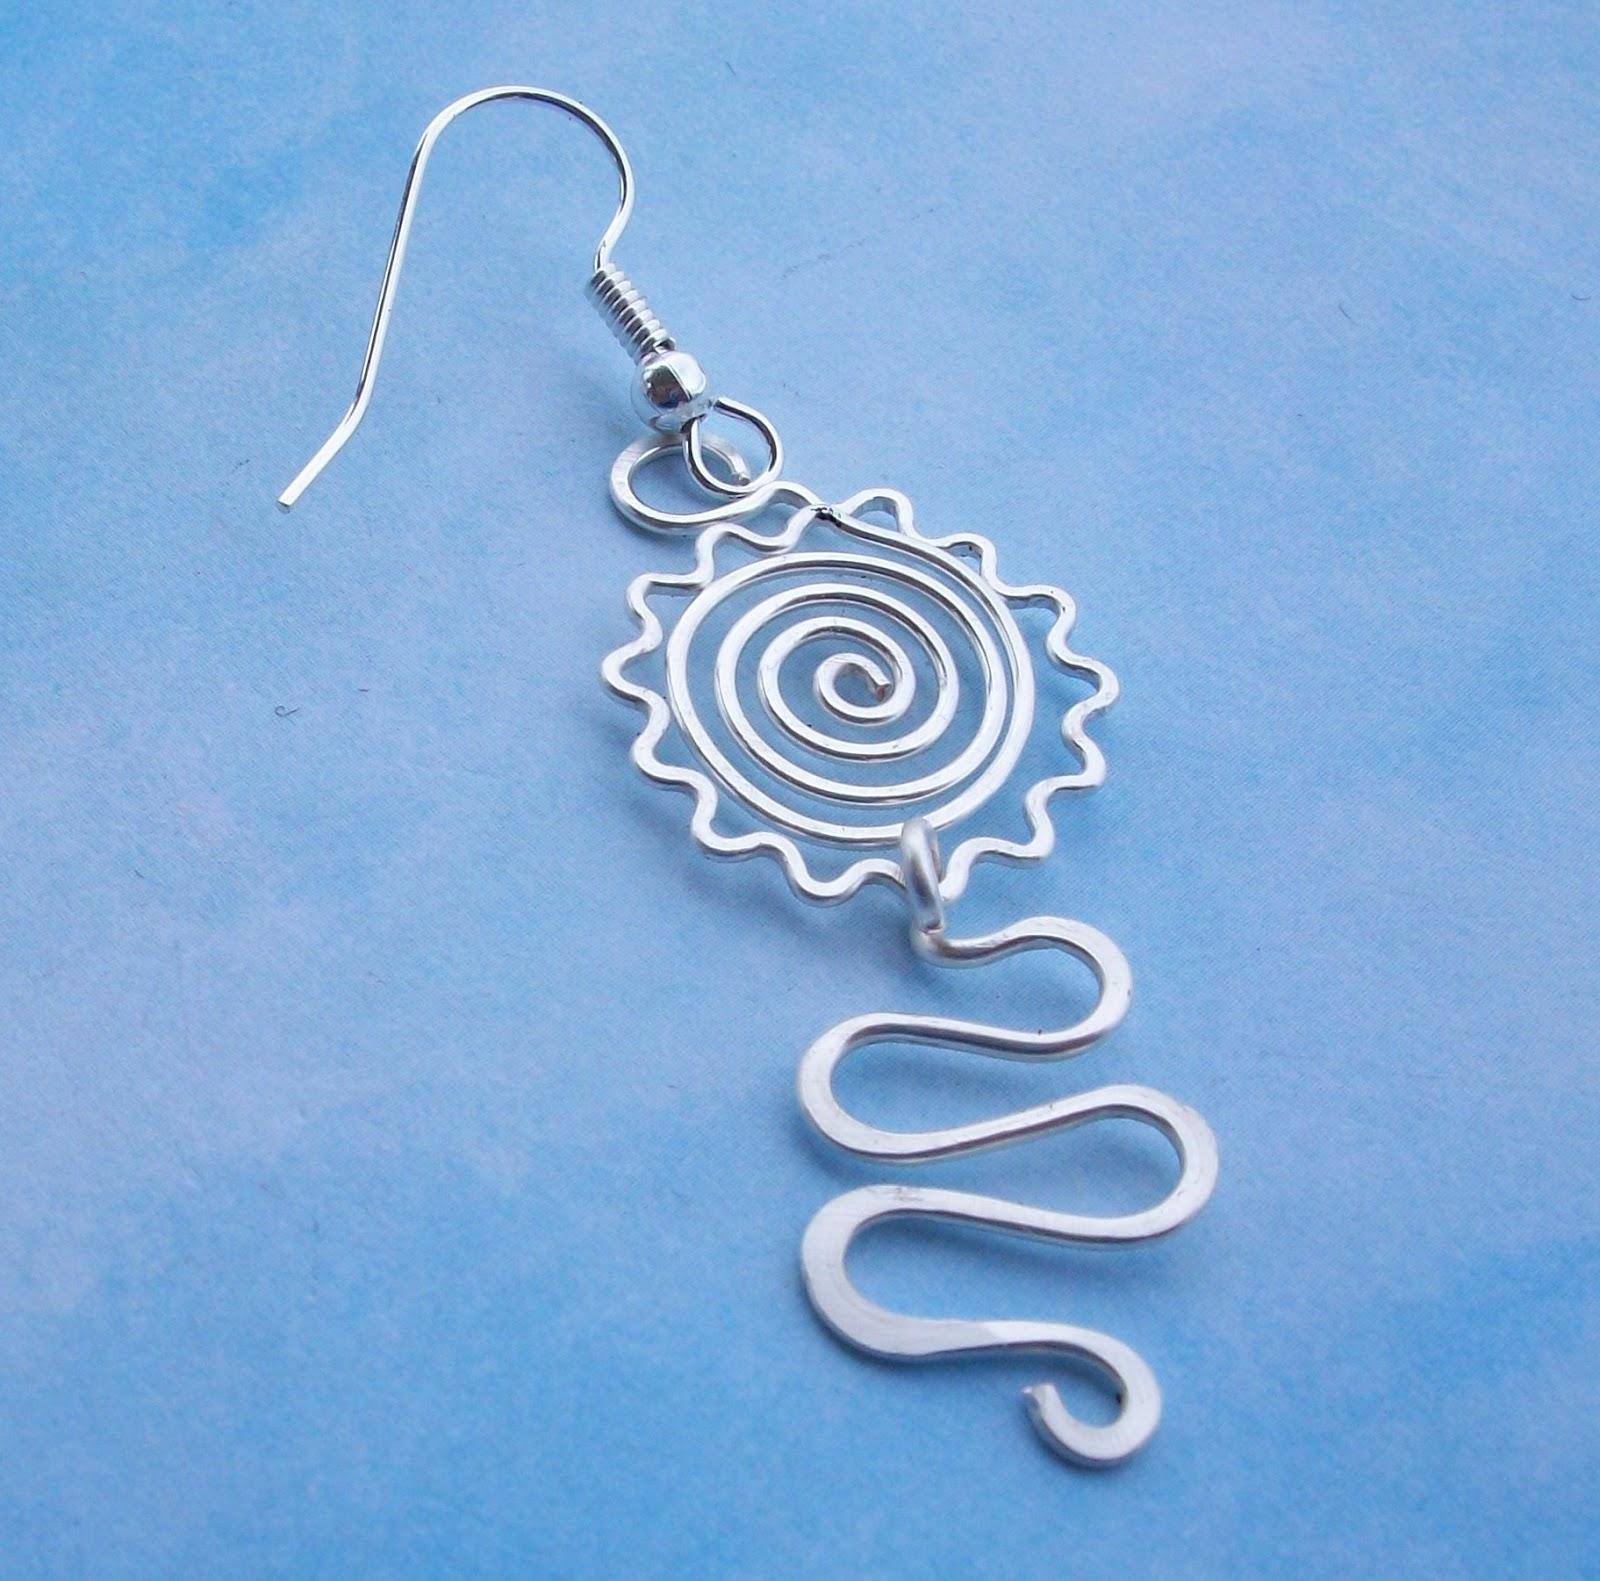 Artyzen Studio by Linda Sinish: Earring Tutorial - Sunny Spiral